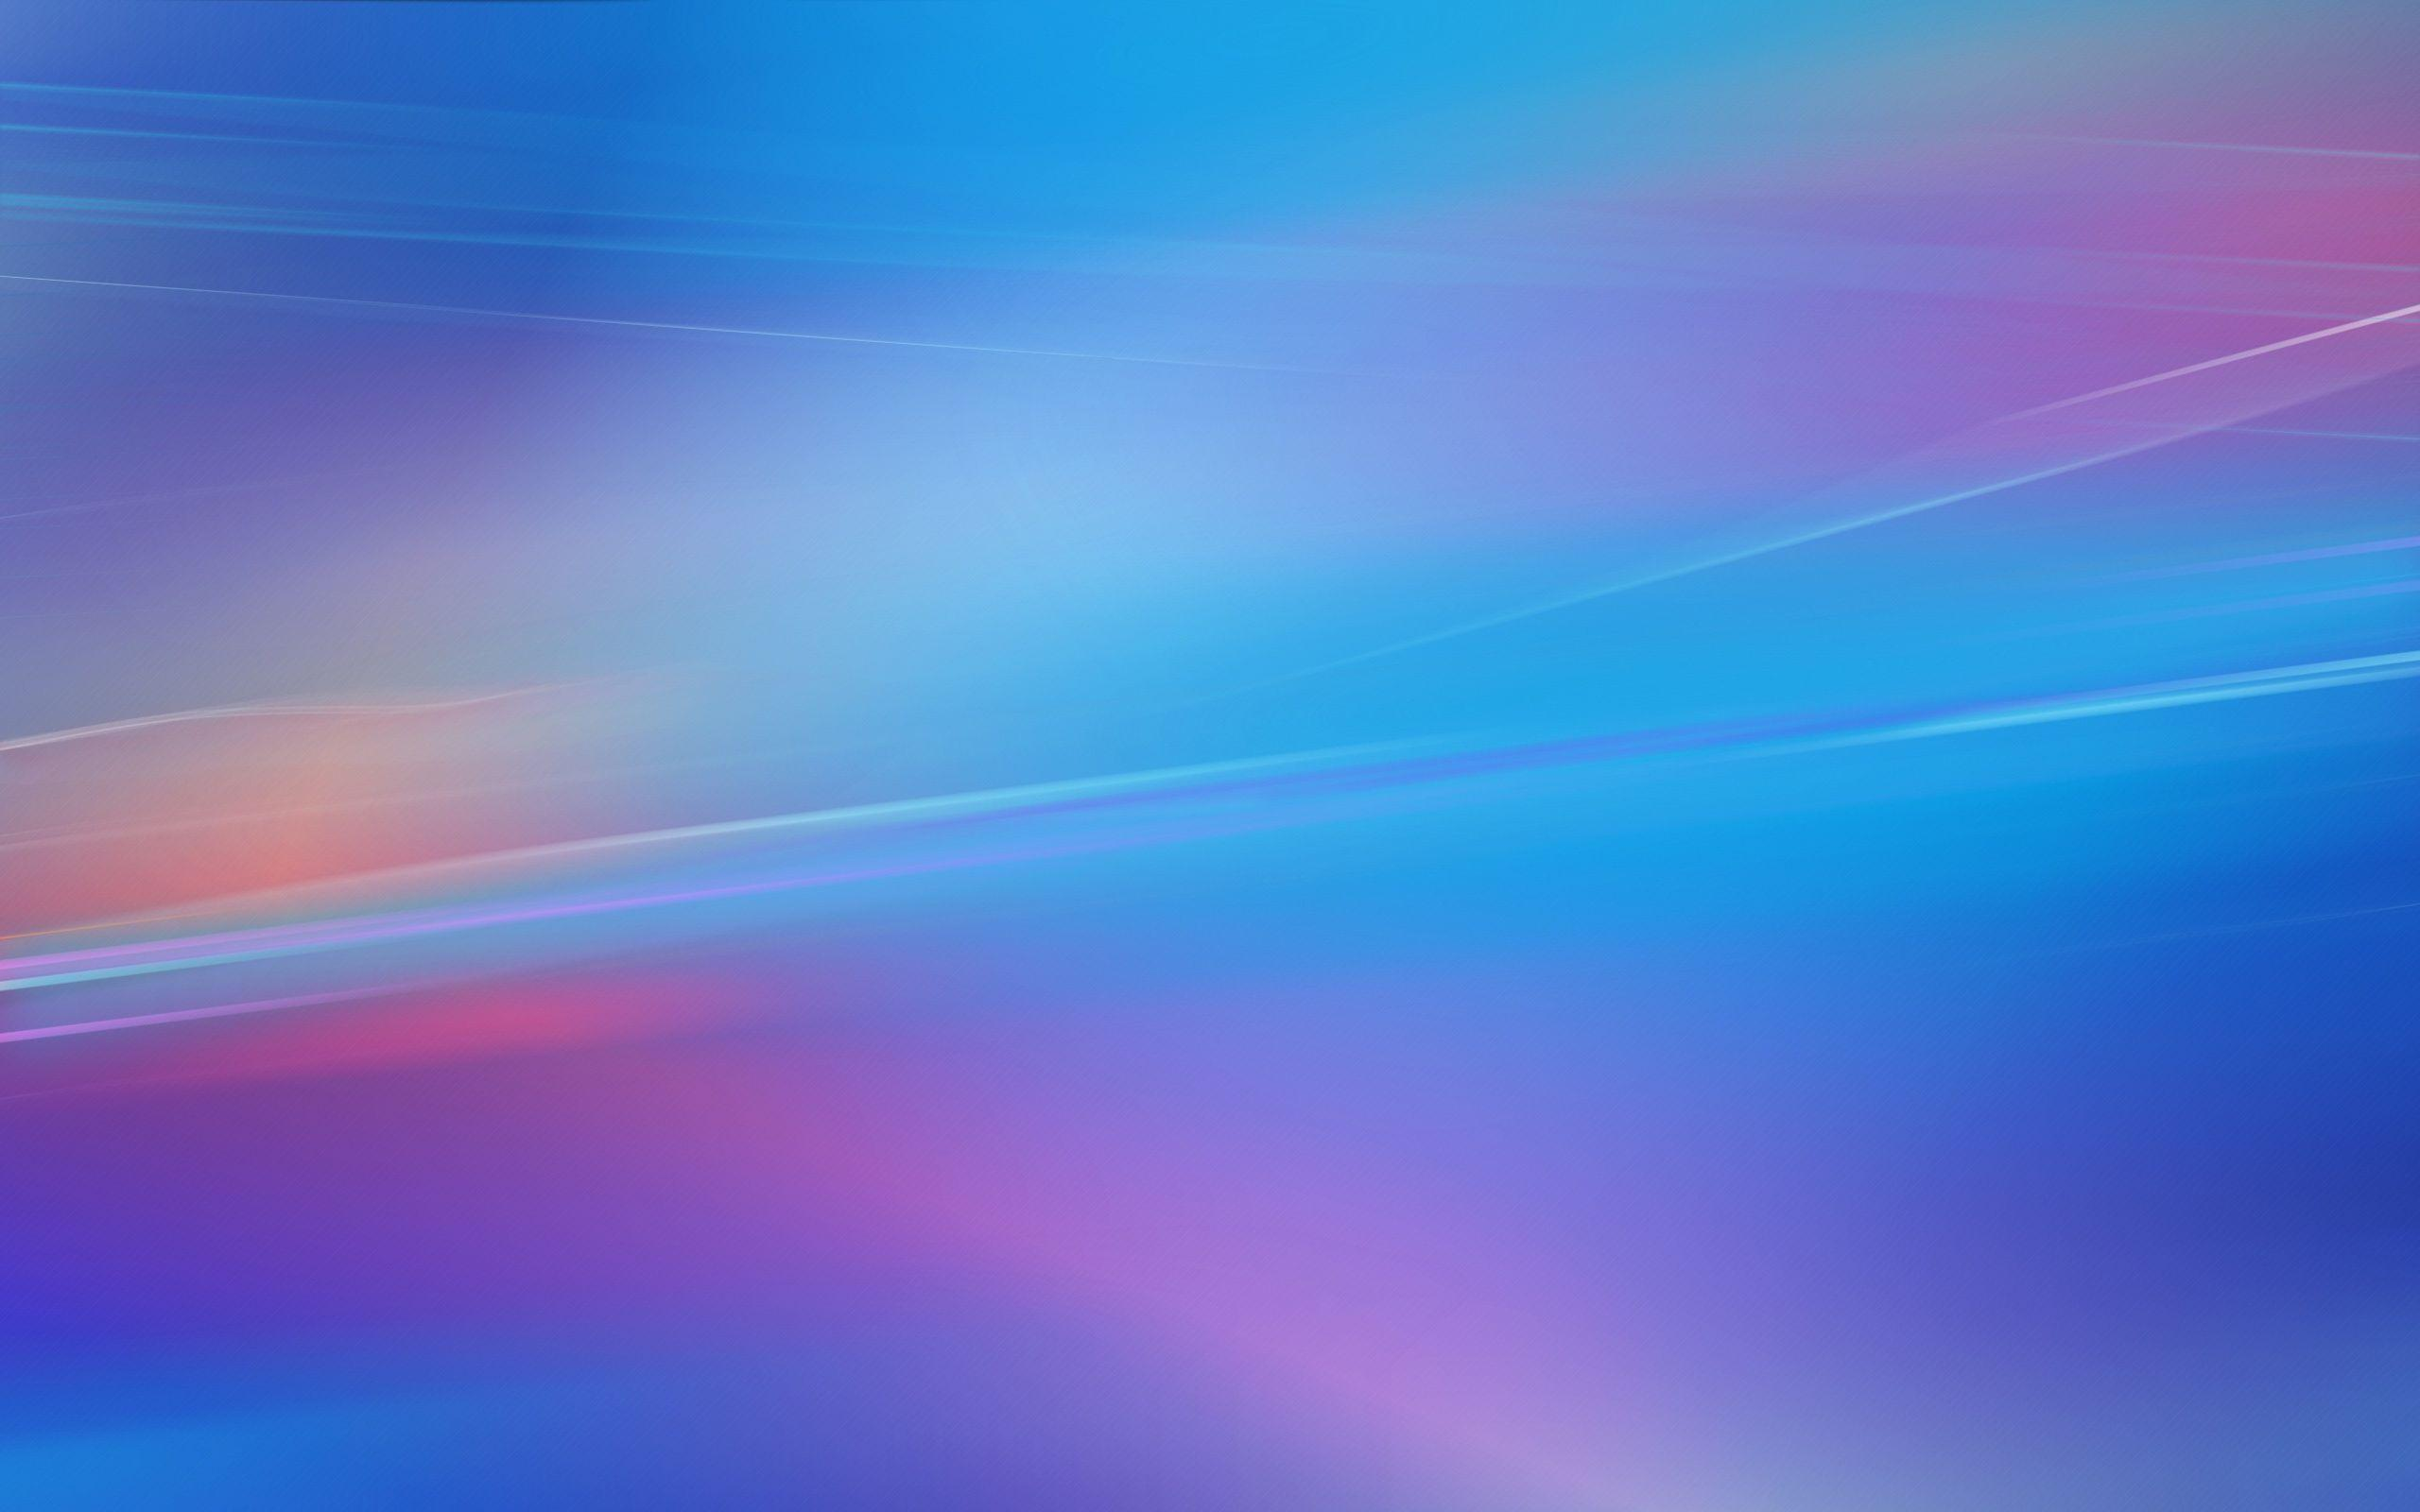 Color Desktop Wallpapers - Wallpaper Cave